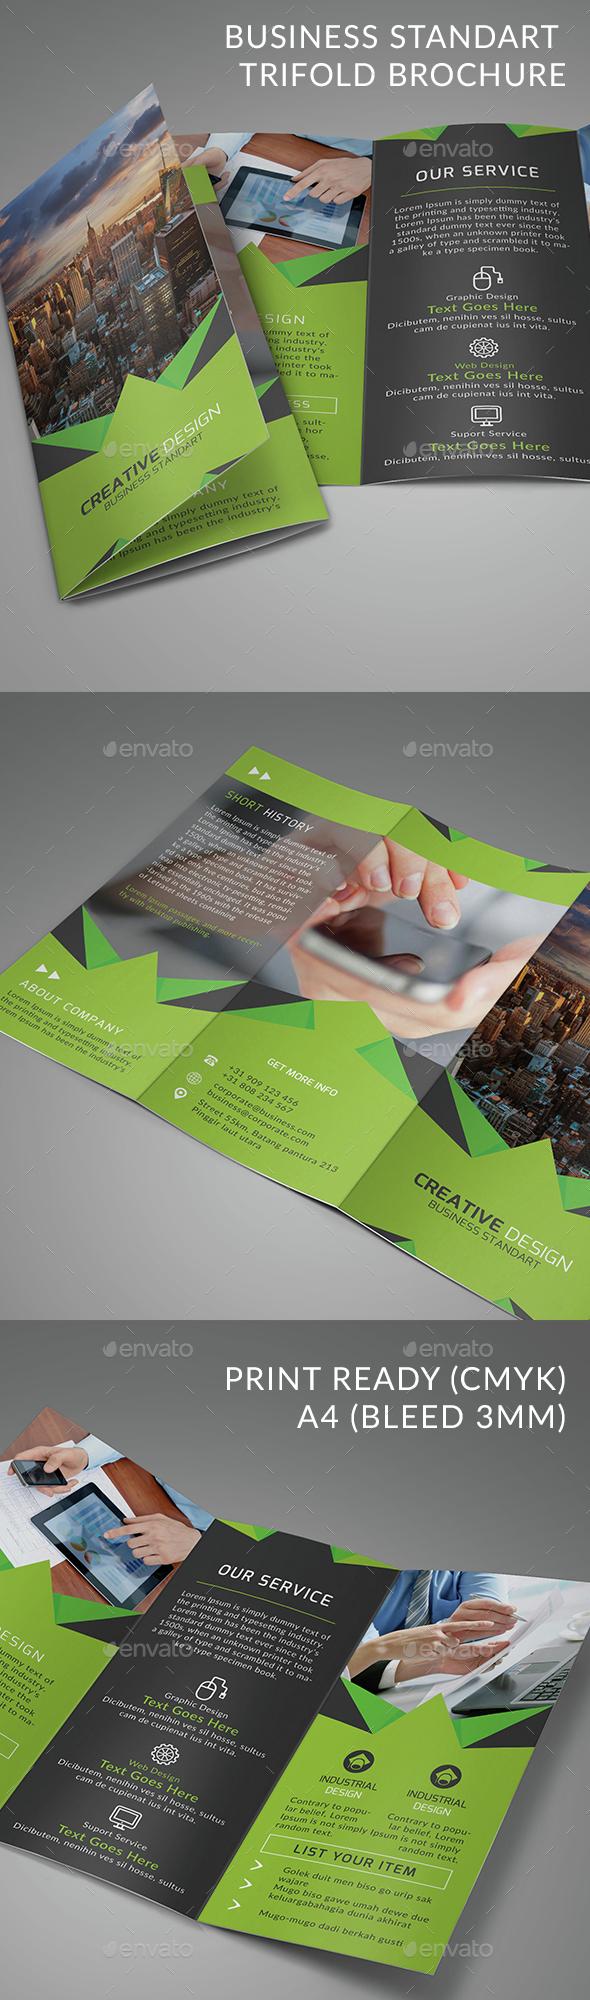 Business Standart Trifold Brochure - Brochures Print Templates